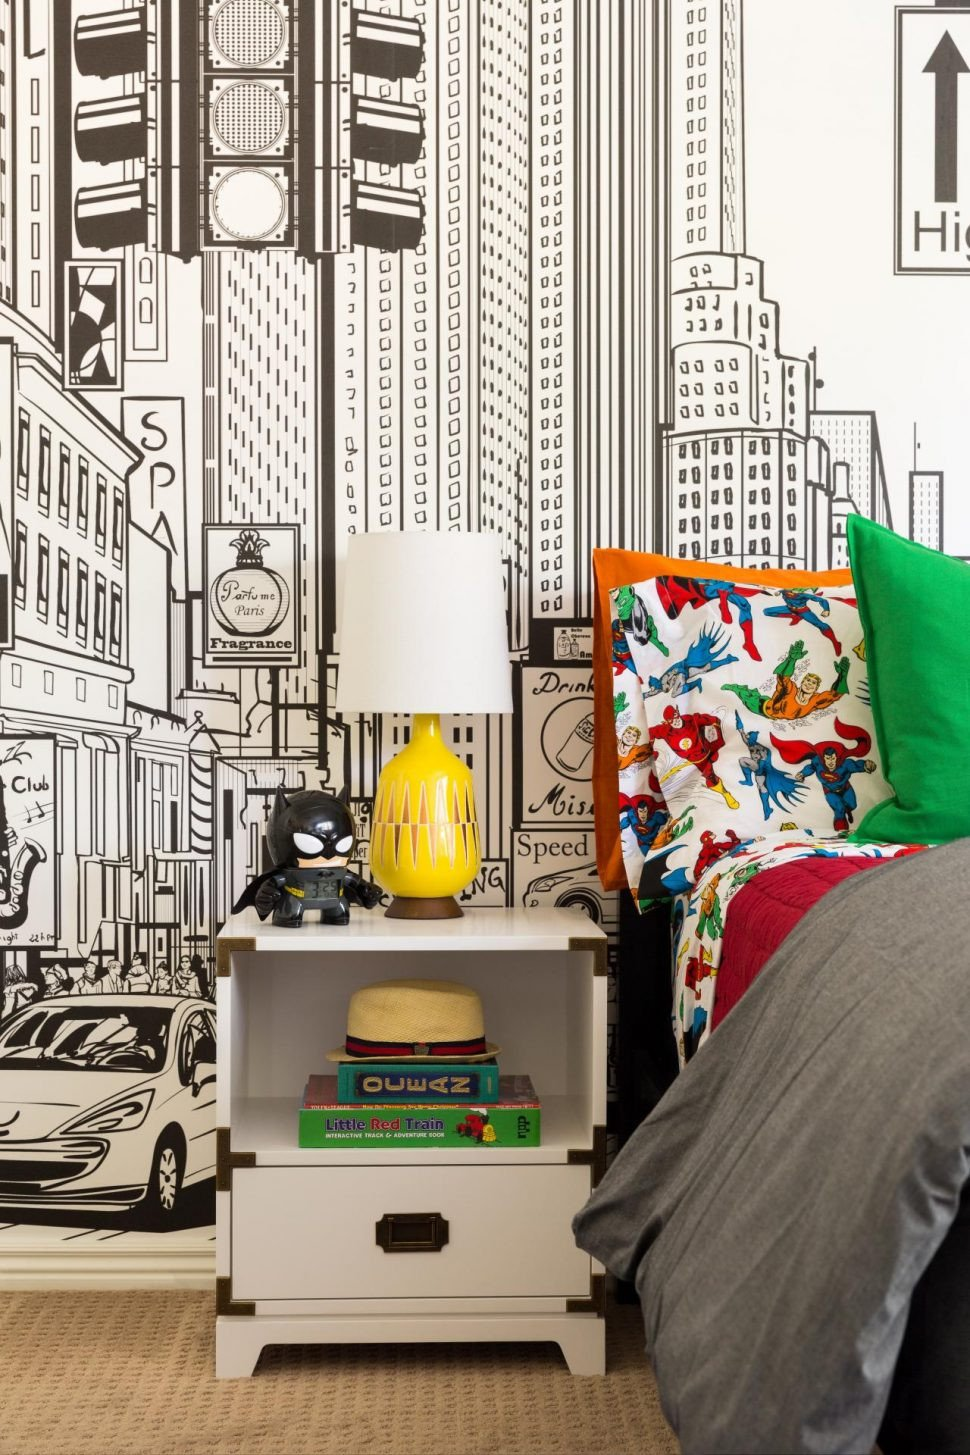 Wallpapers for Girls Bedroom Elegant Bedroom Wall Murals Painting Digital La S and Allies